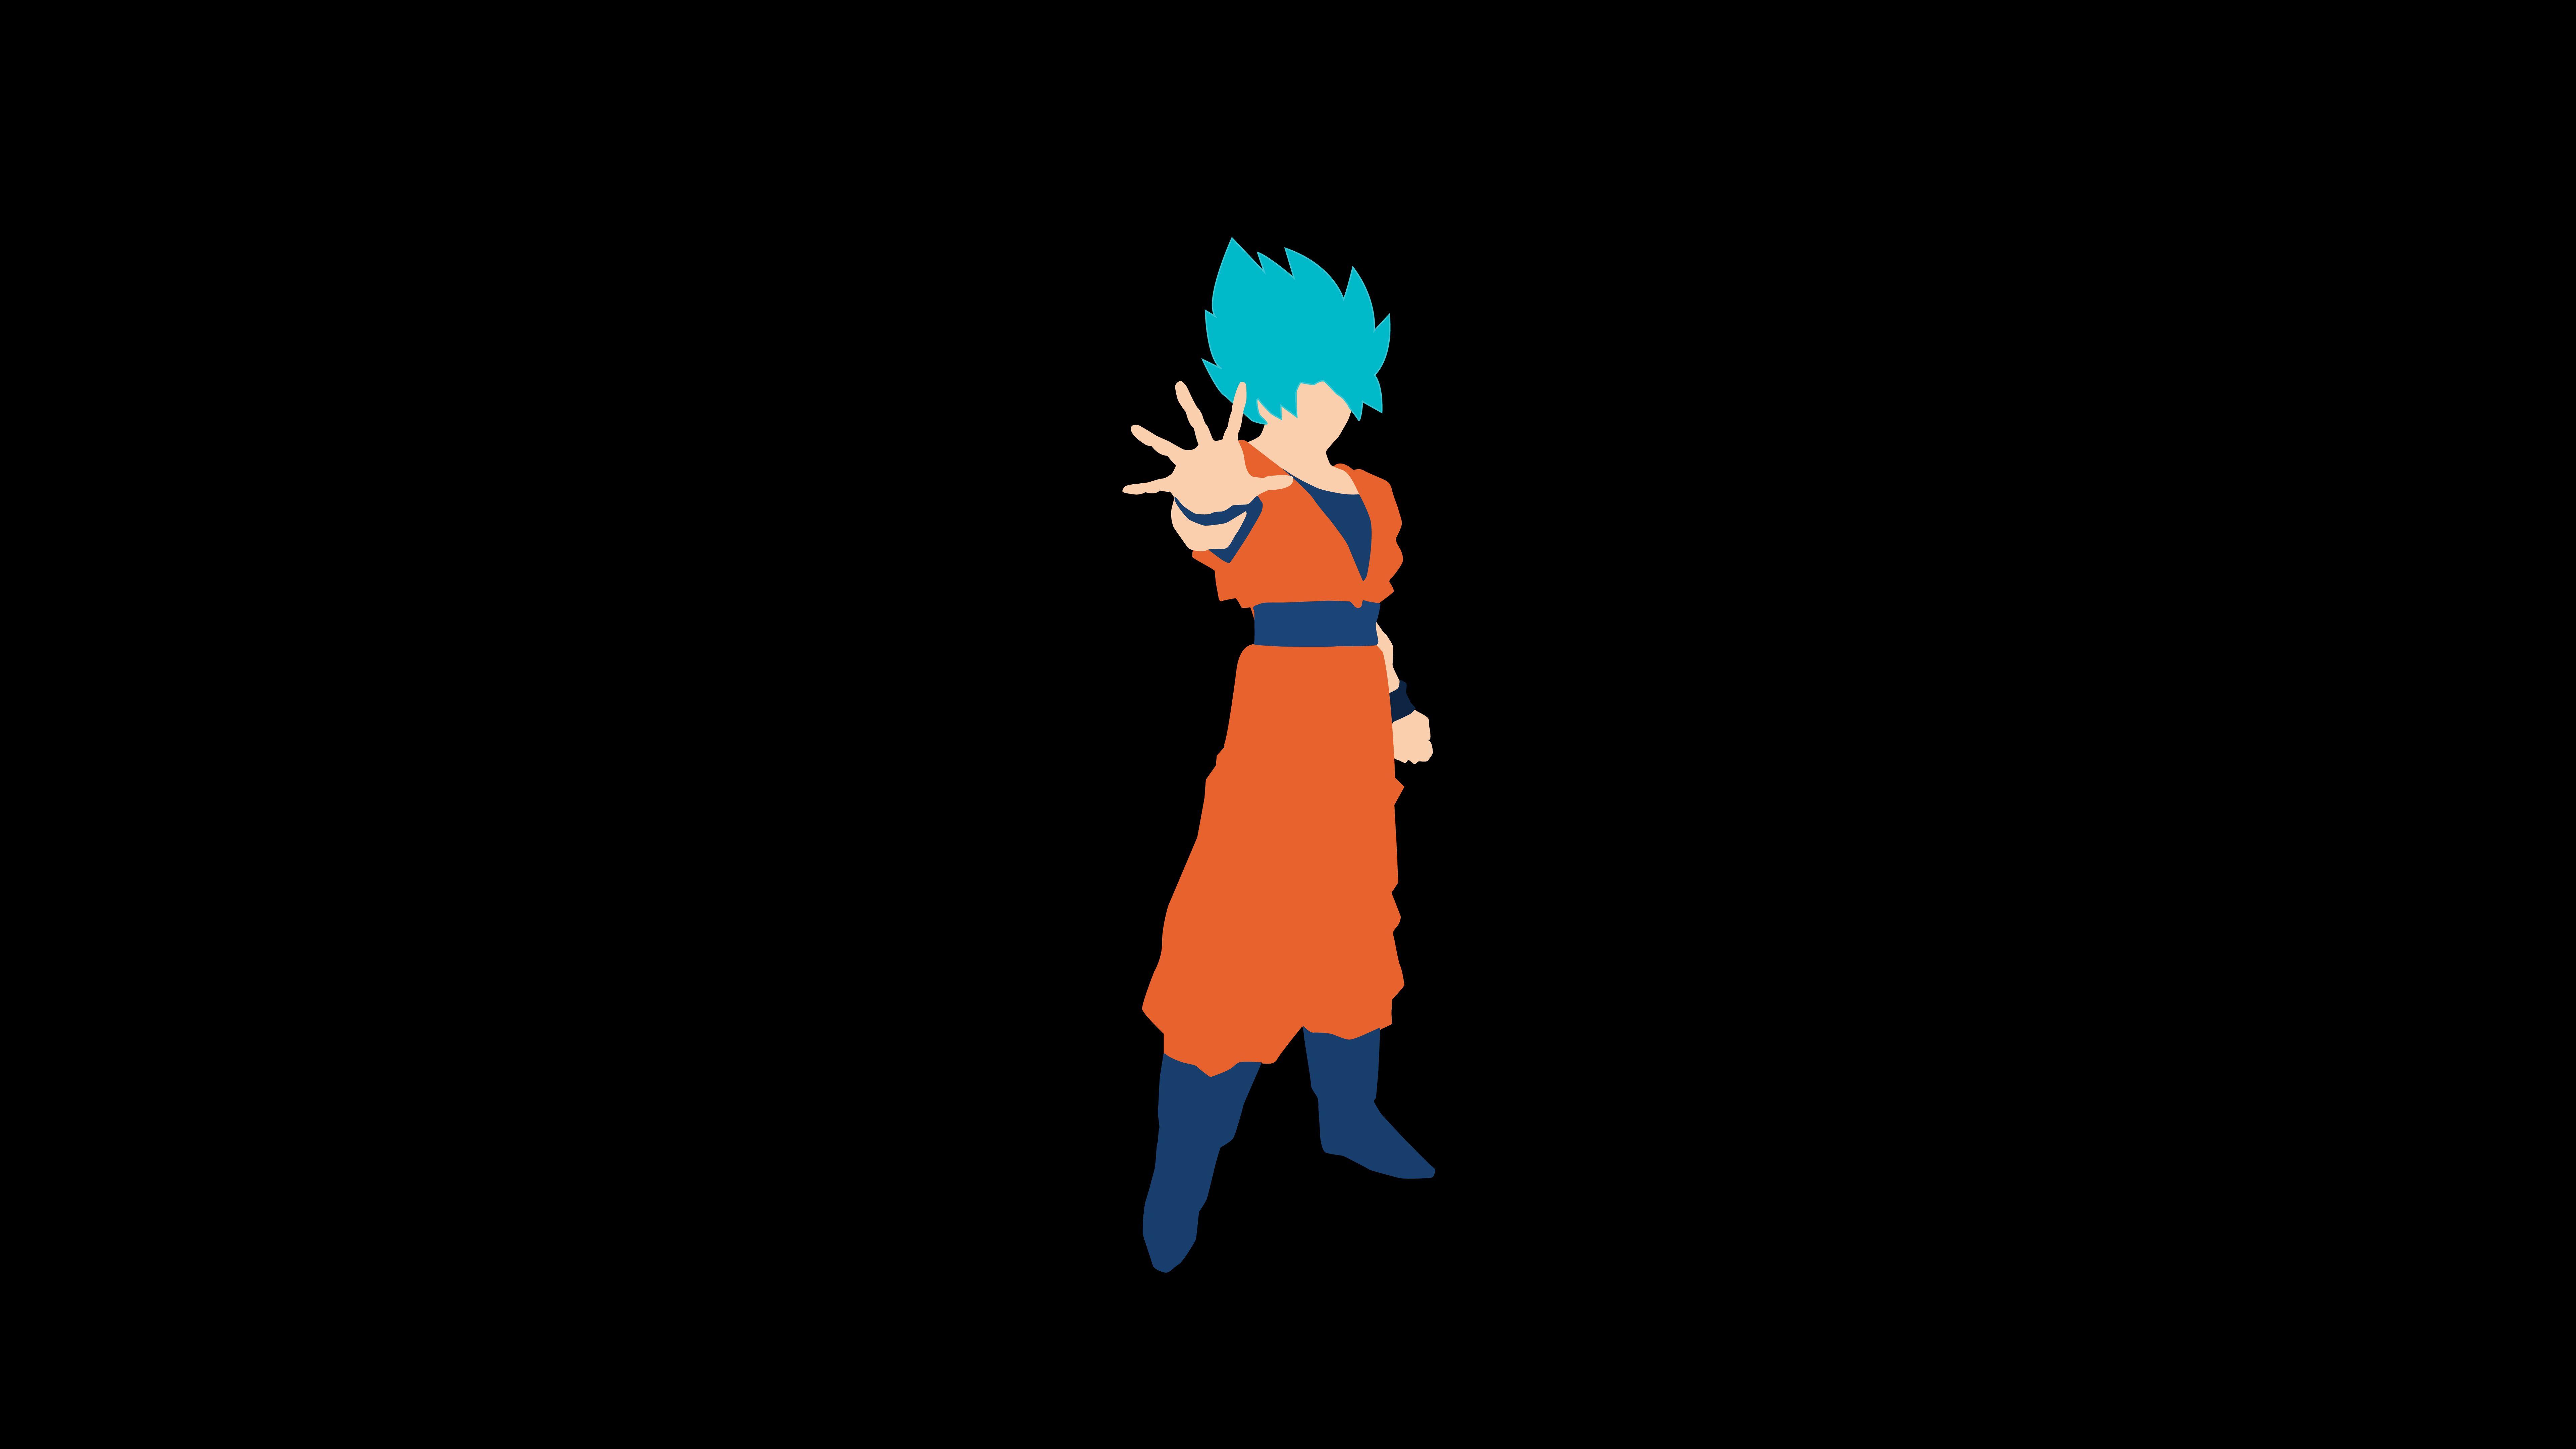 Goku Minimalism 8k Https Hdwallpapersmafia Com Goku Minimalism 8k 4k Wallpapers 5k Wallpapers 8k Wallpapers Anime Wallpapers Artwork W Balao Tapete